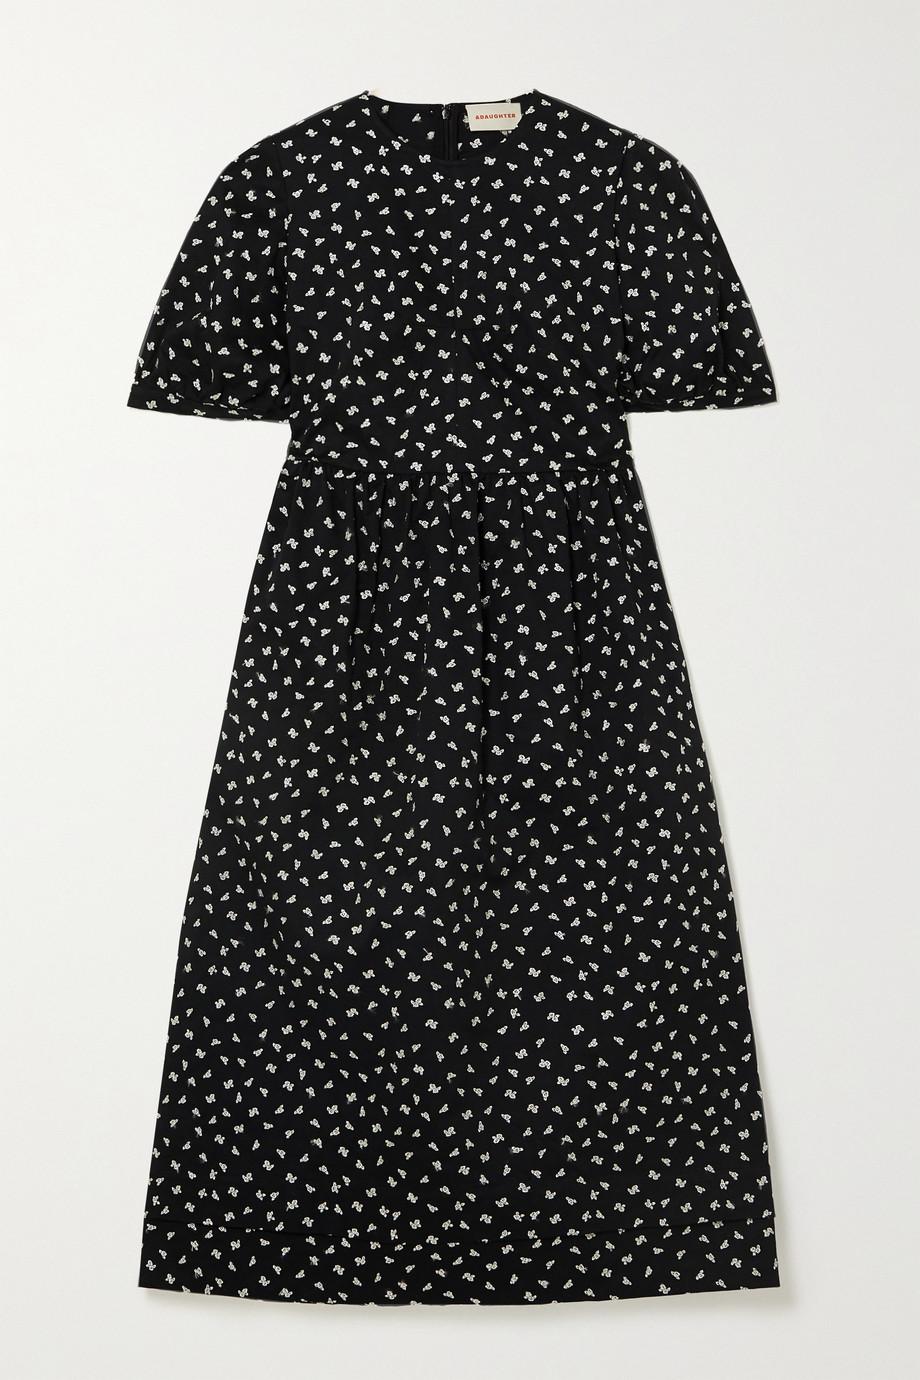 &Daughter + NET SUSTAIN Dawn embroidered cotton-gabardine midi dress